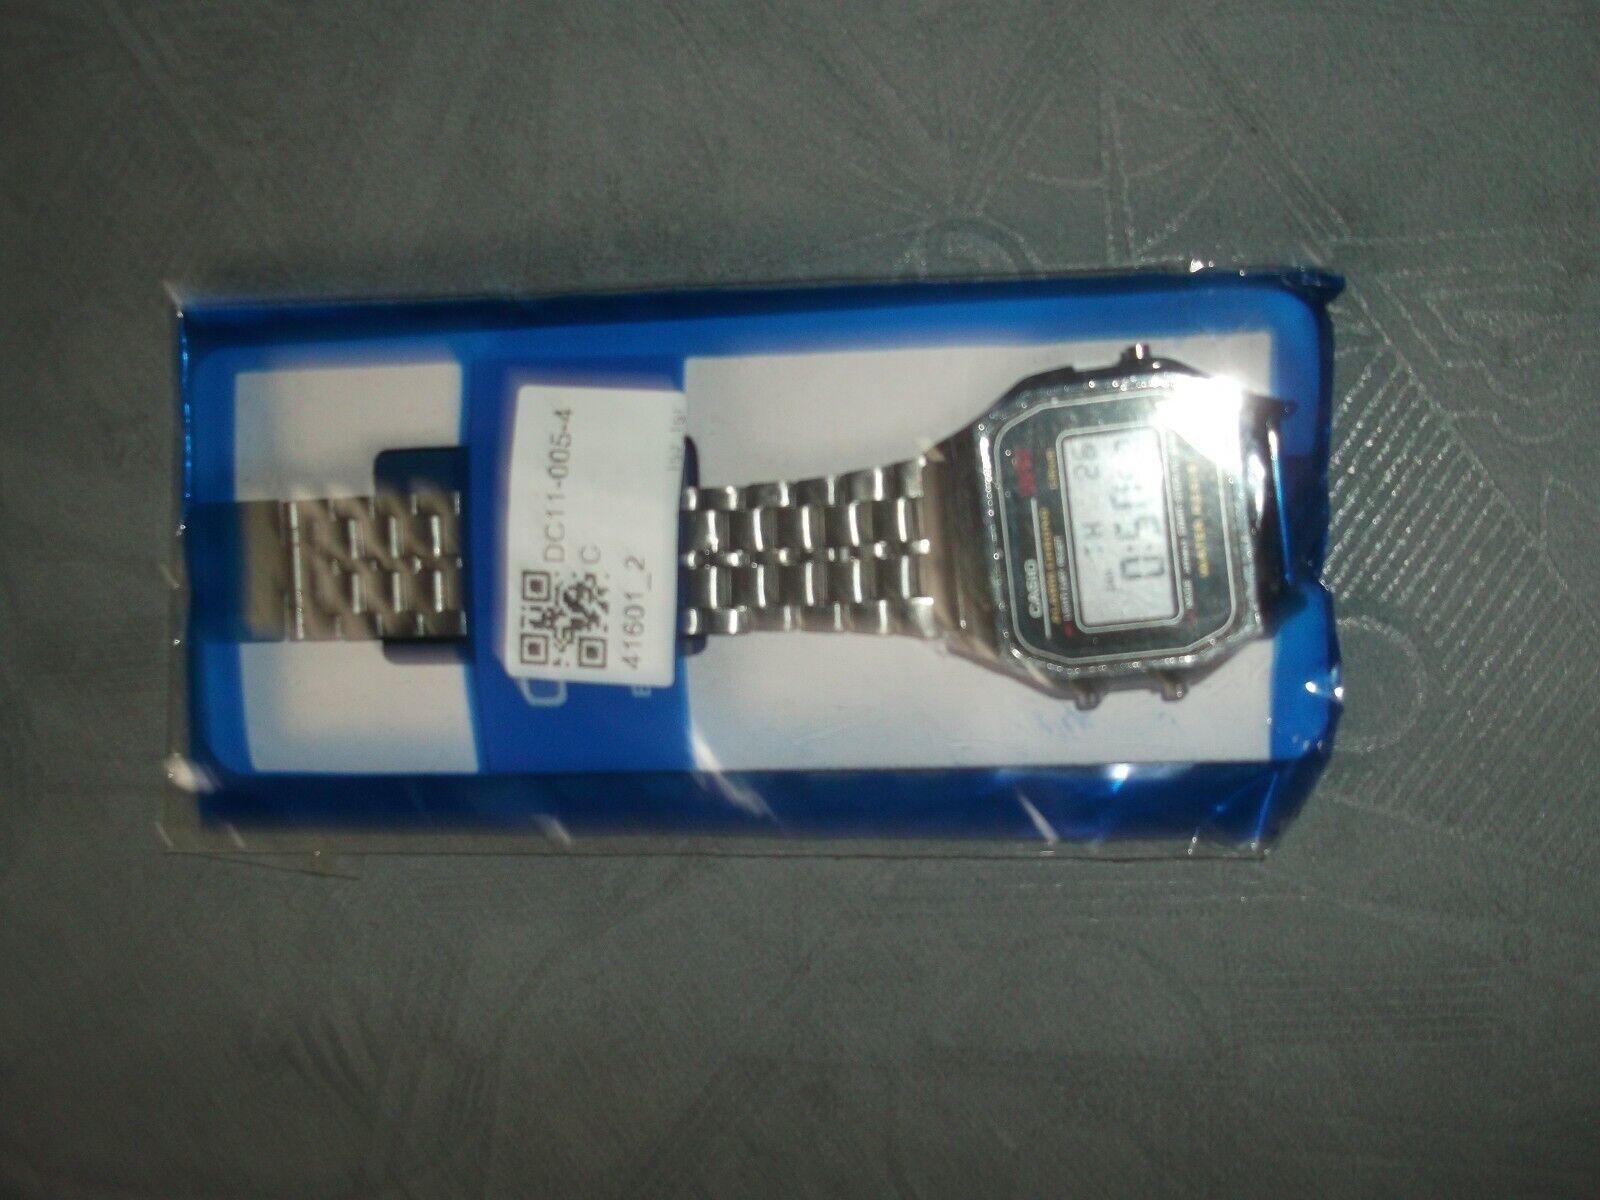 Herrenuhr, Armbanduhr Retro Uhr 70er 80er Style Watch, Digital Uhr HAULED 01